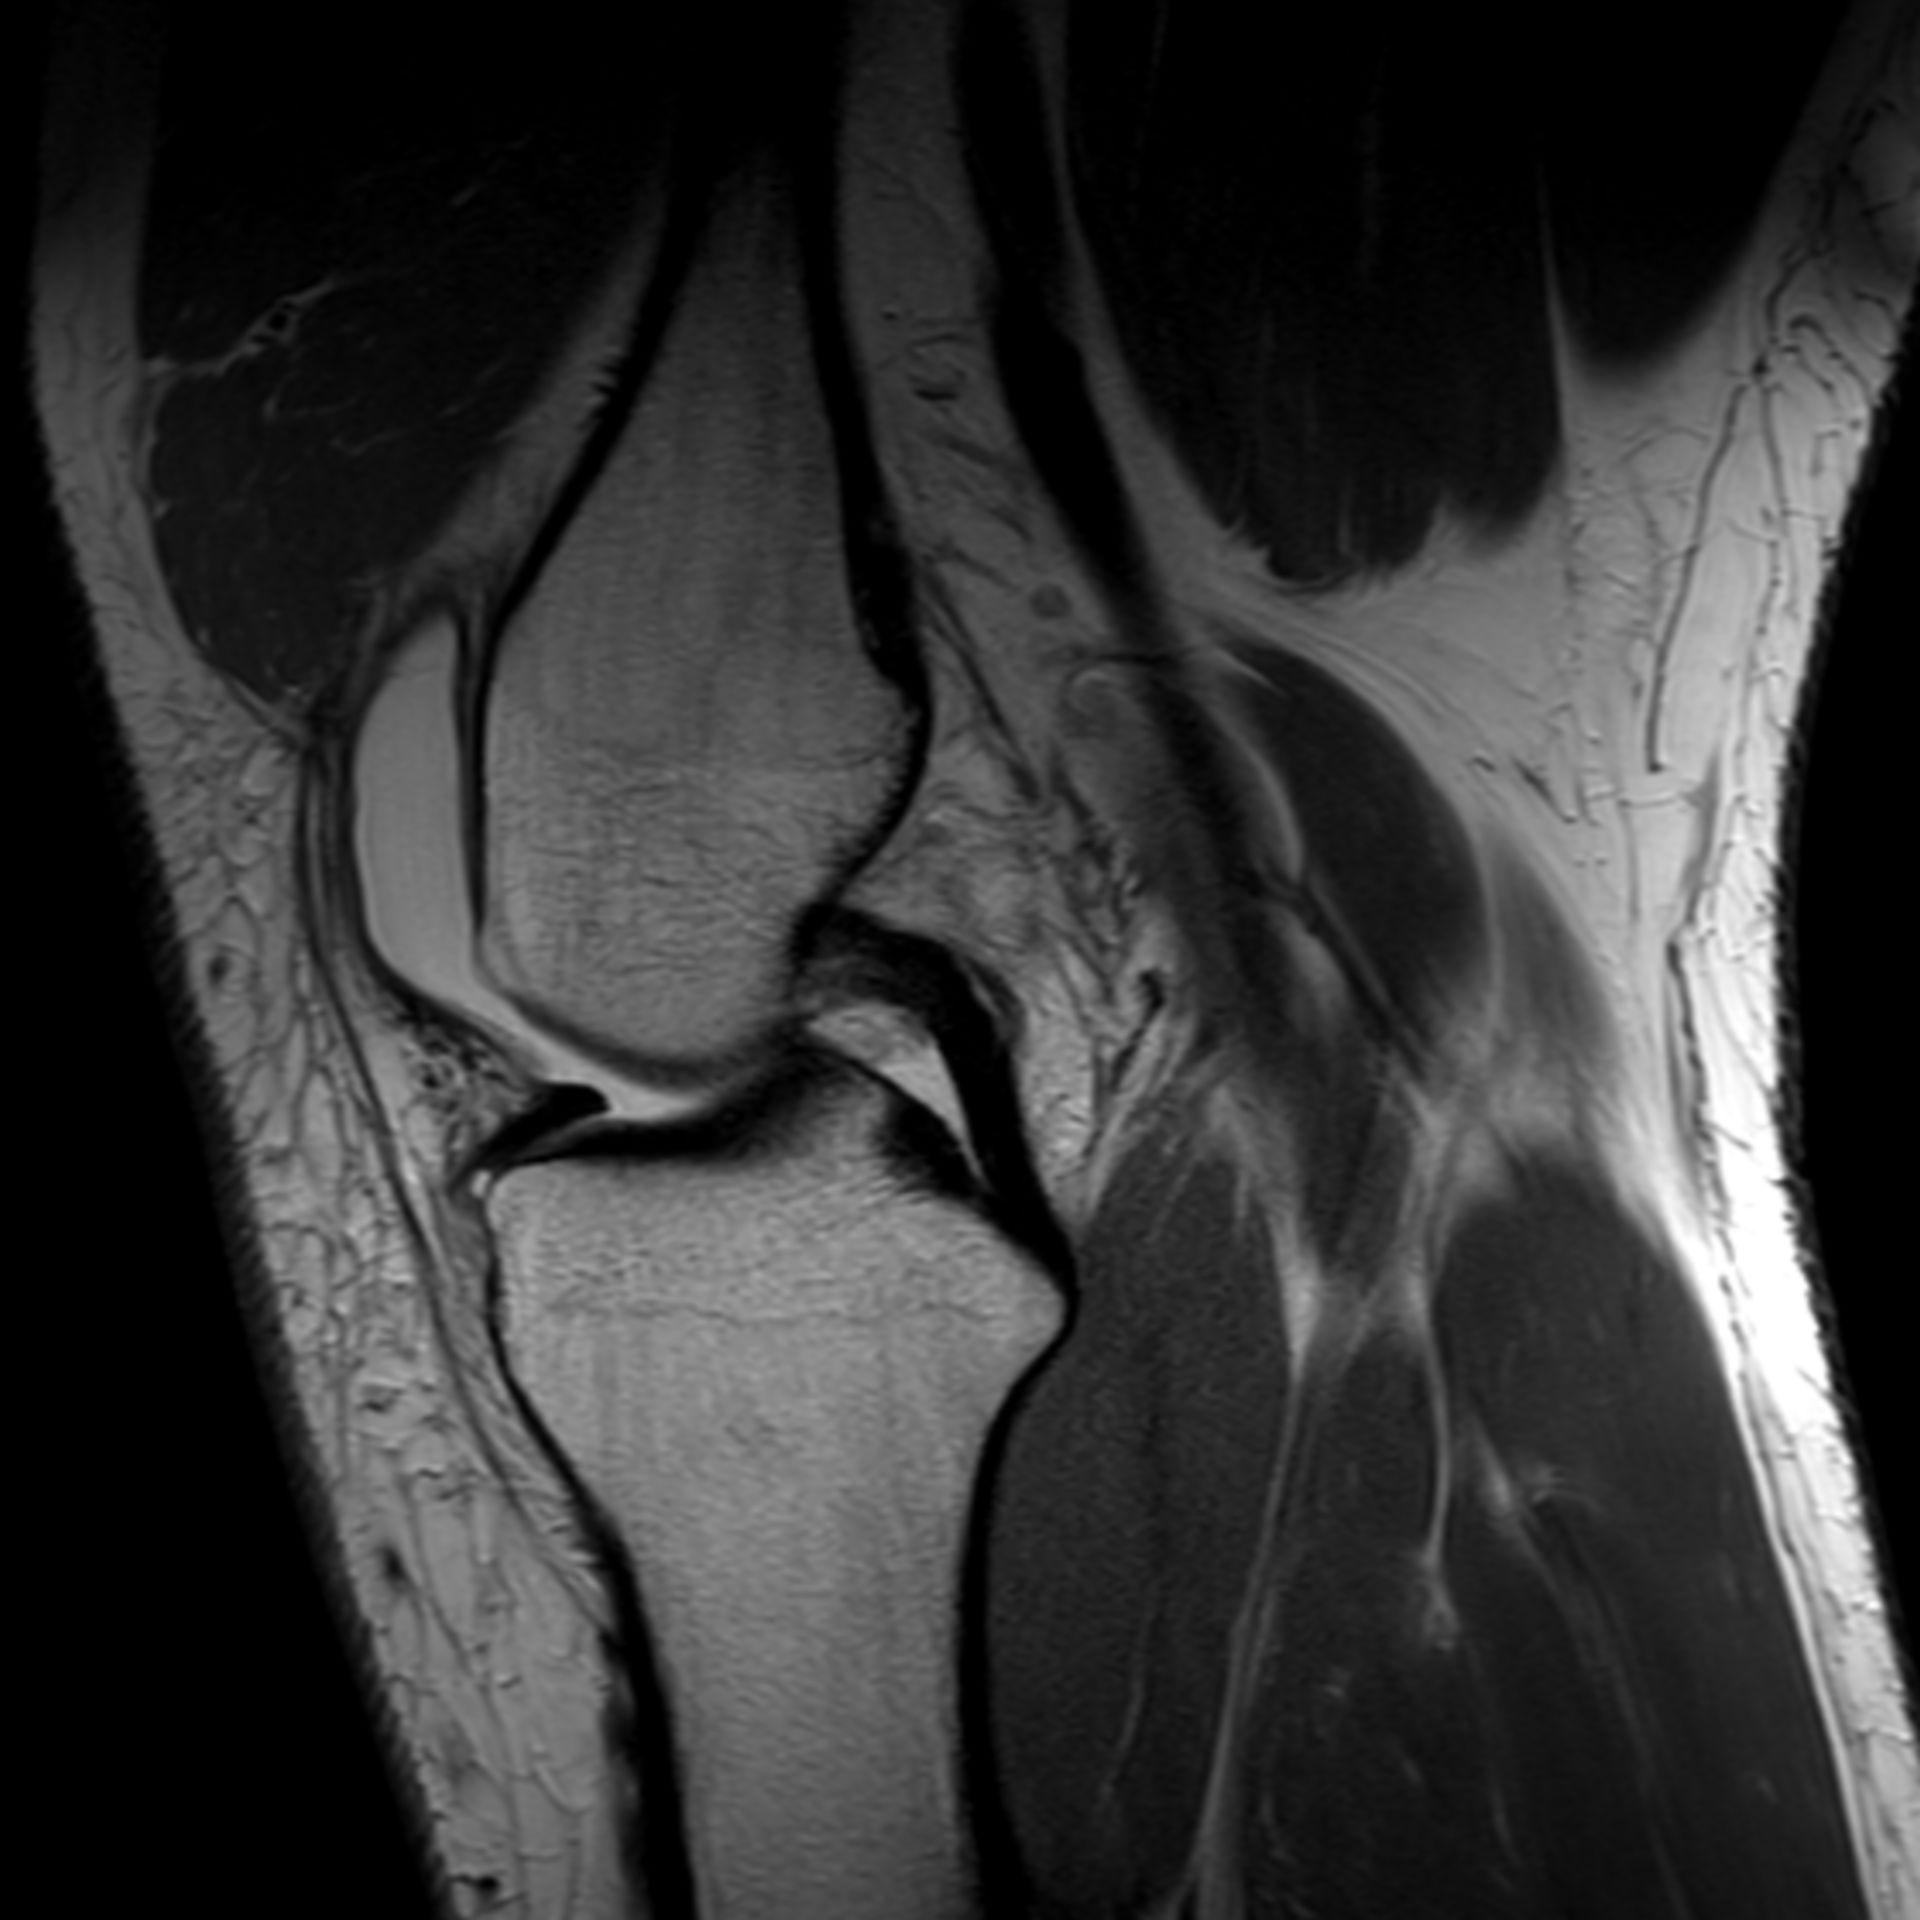 pd_tse_sag2: MRT-Aufnahme des Kniegelenkes in sagittaler Ebene